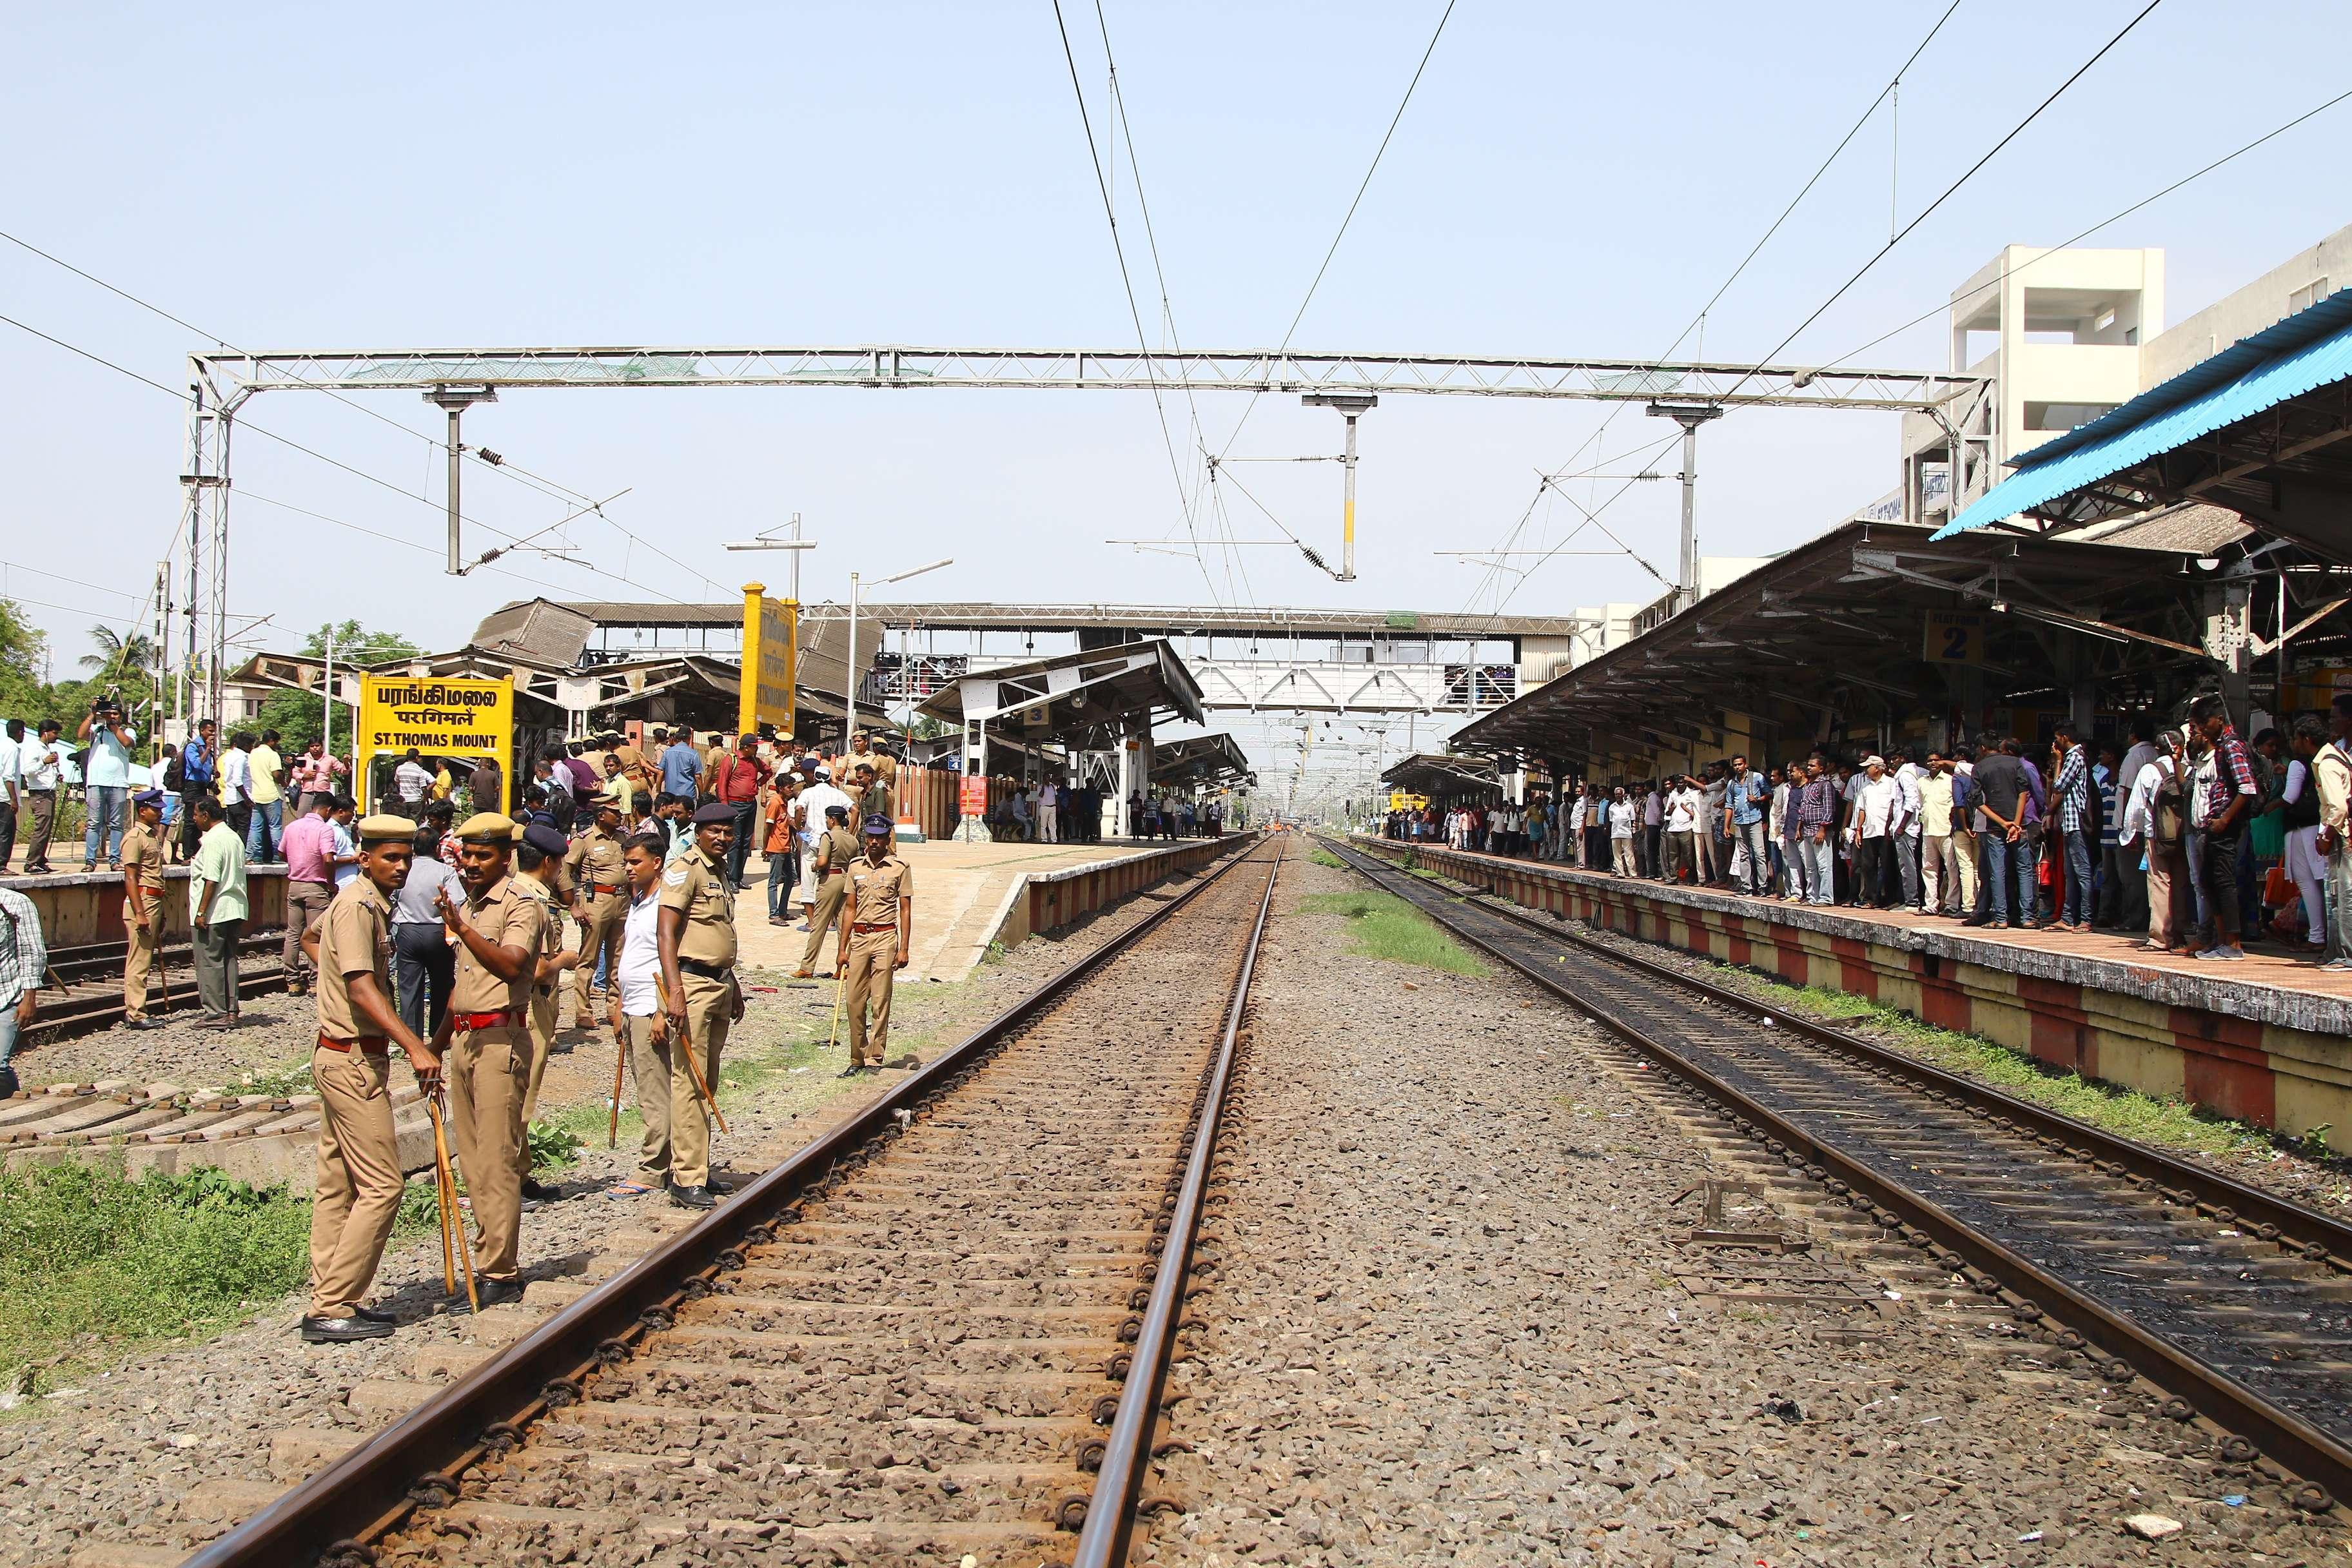 Tragedy to Chennai City, Claims 6 lives